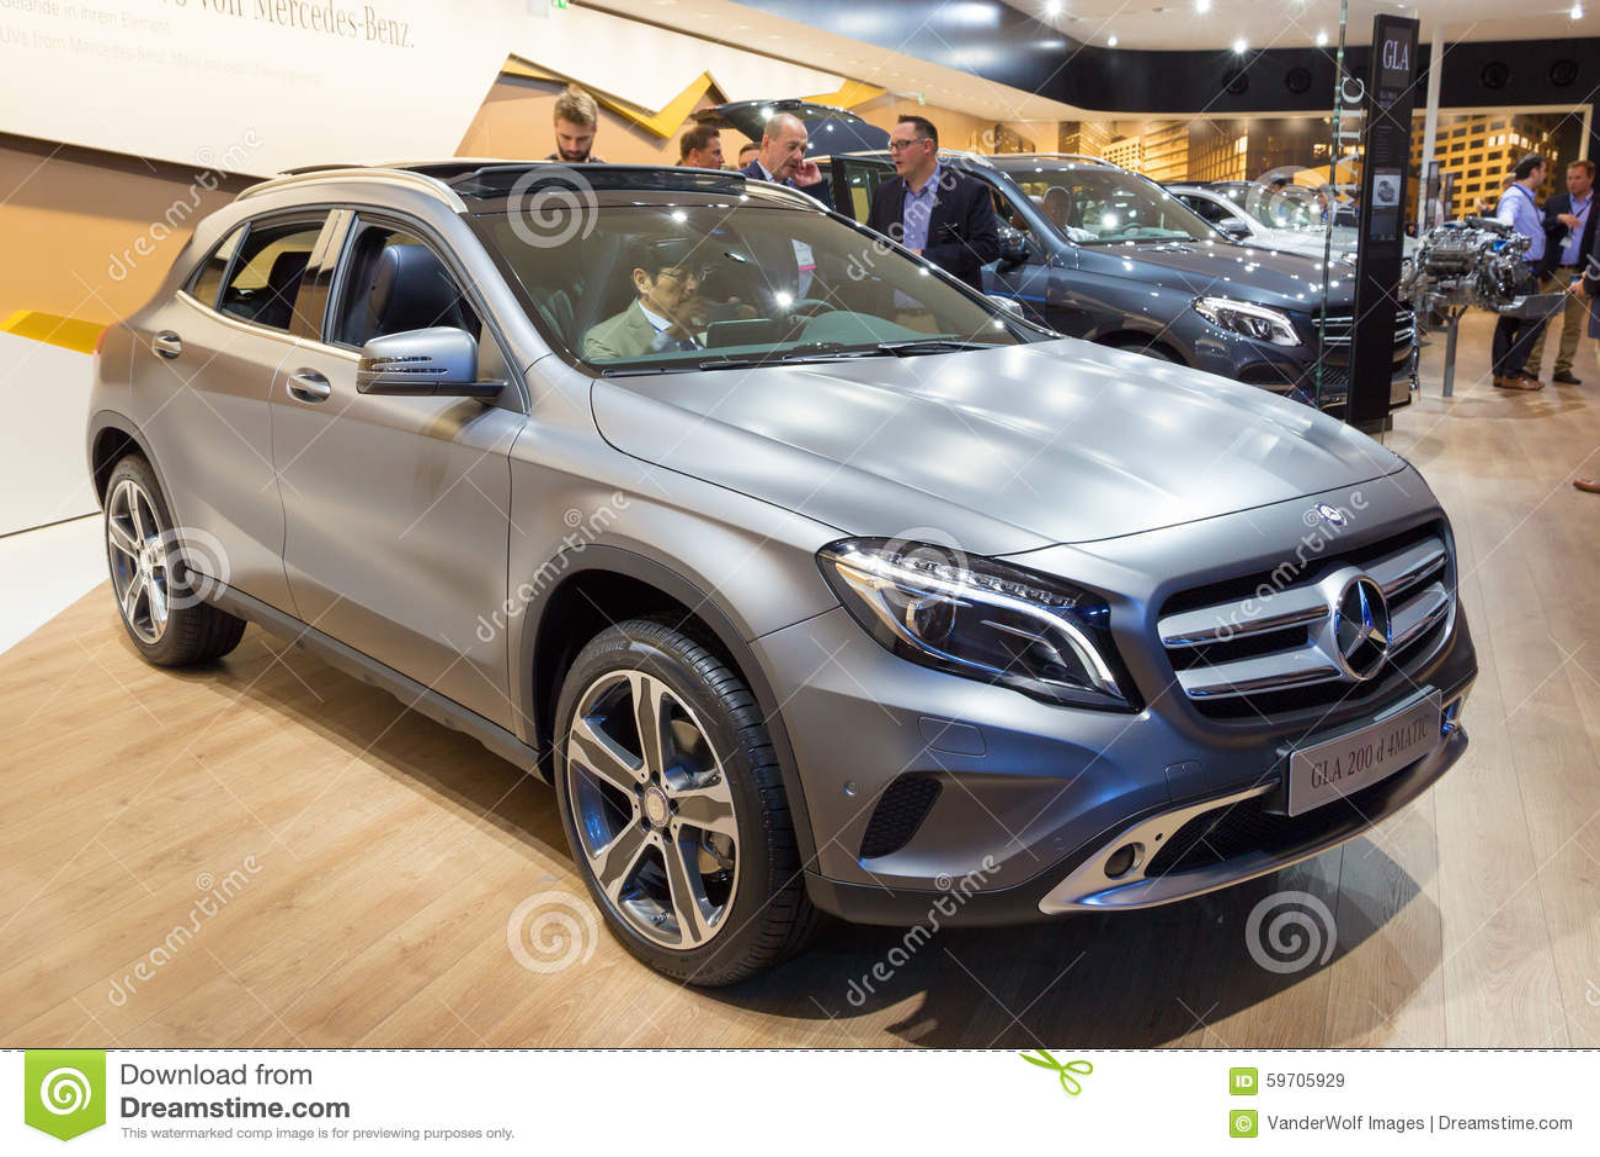 Mercedes Benz Gla 200d 4matic Editorial Stock Image Image 59705929